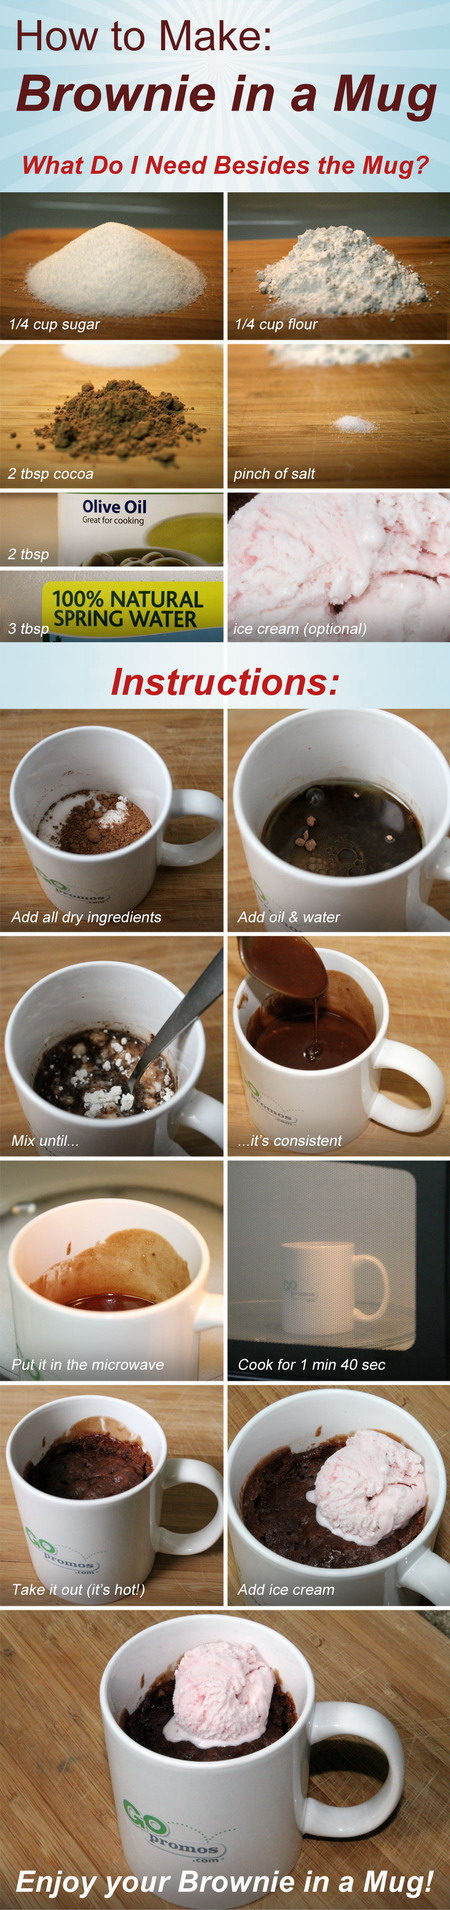 微波爐2分鐘做馬克杯布朗尼 Brownie in a Mug-20130822